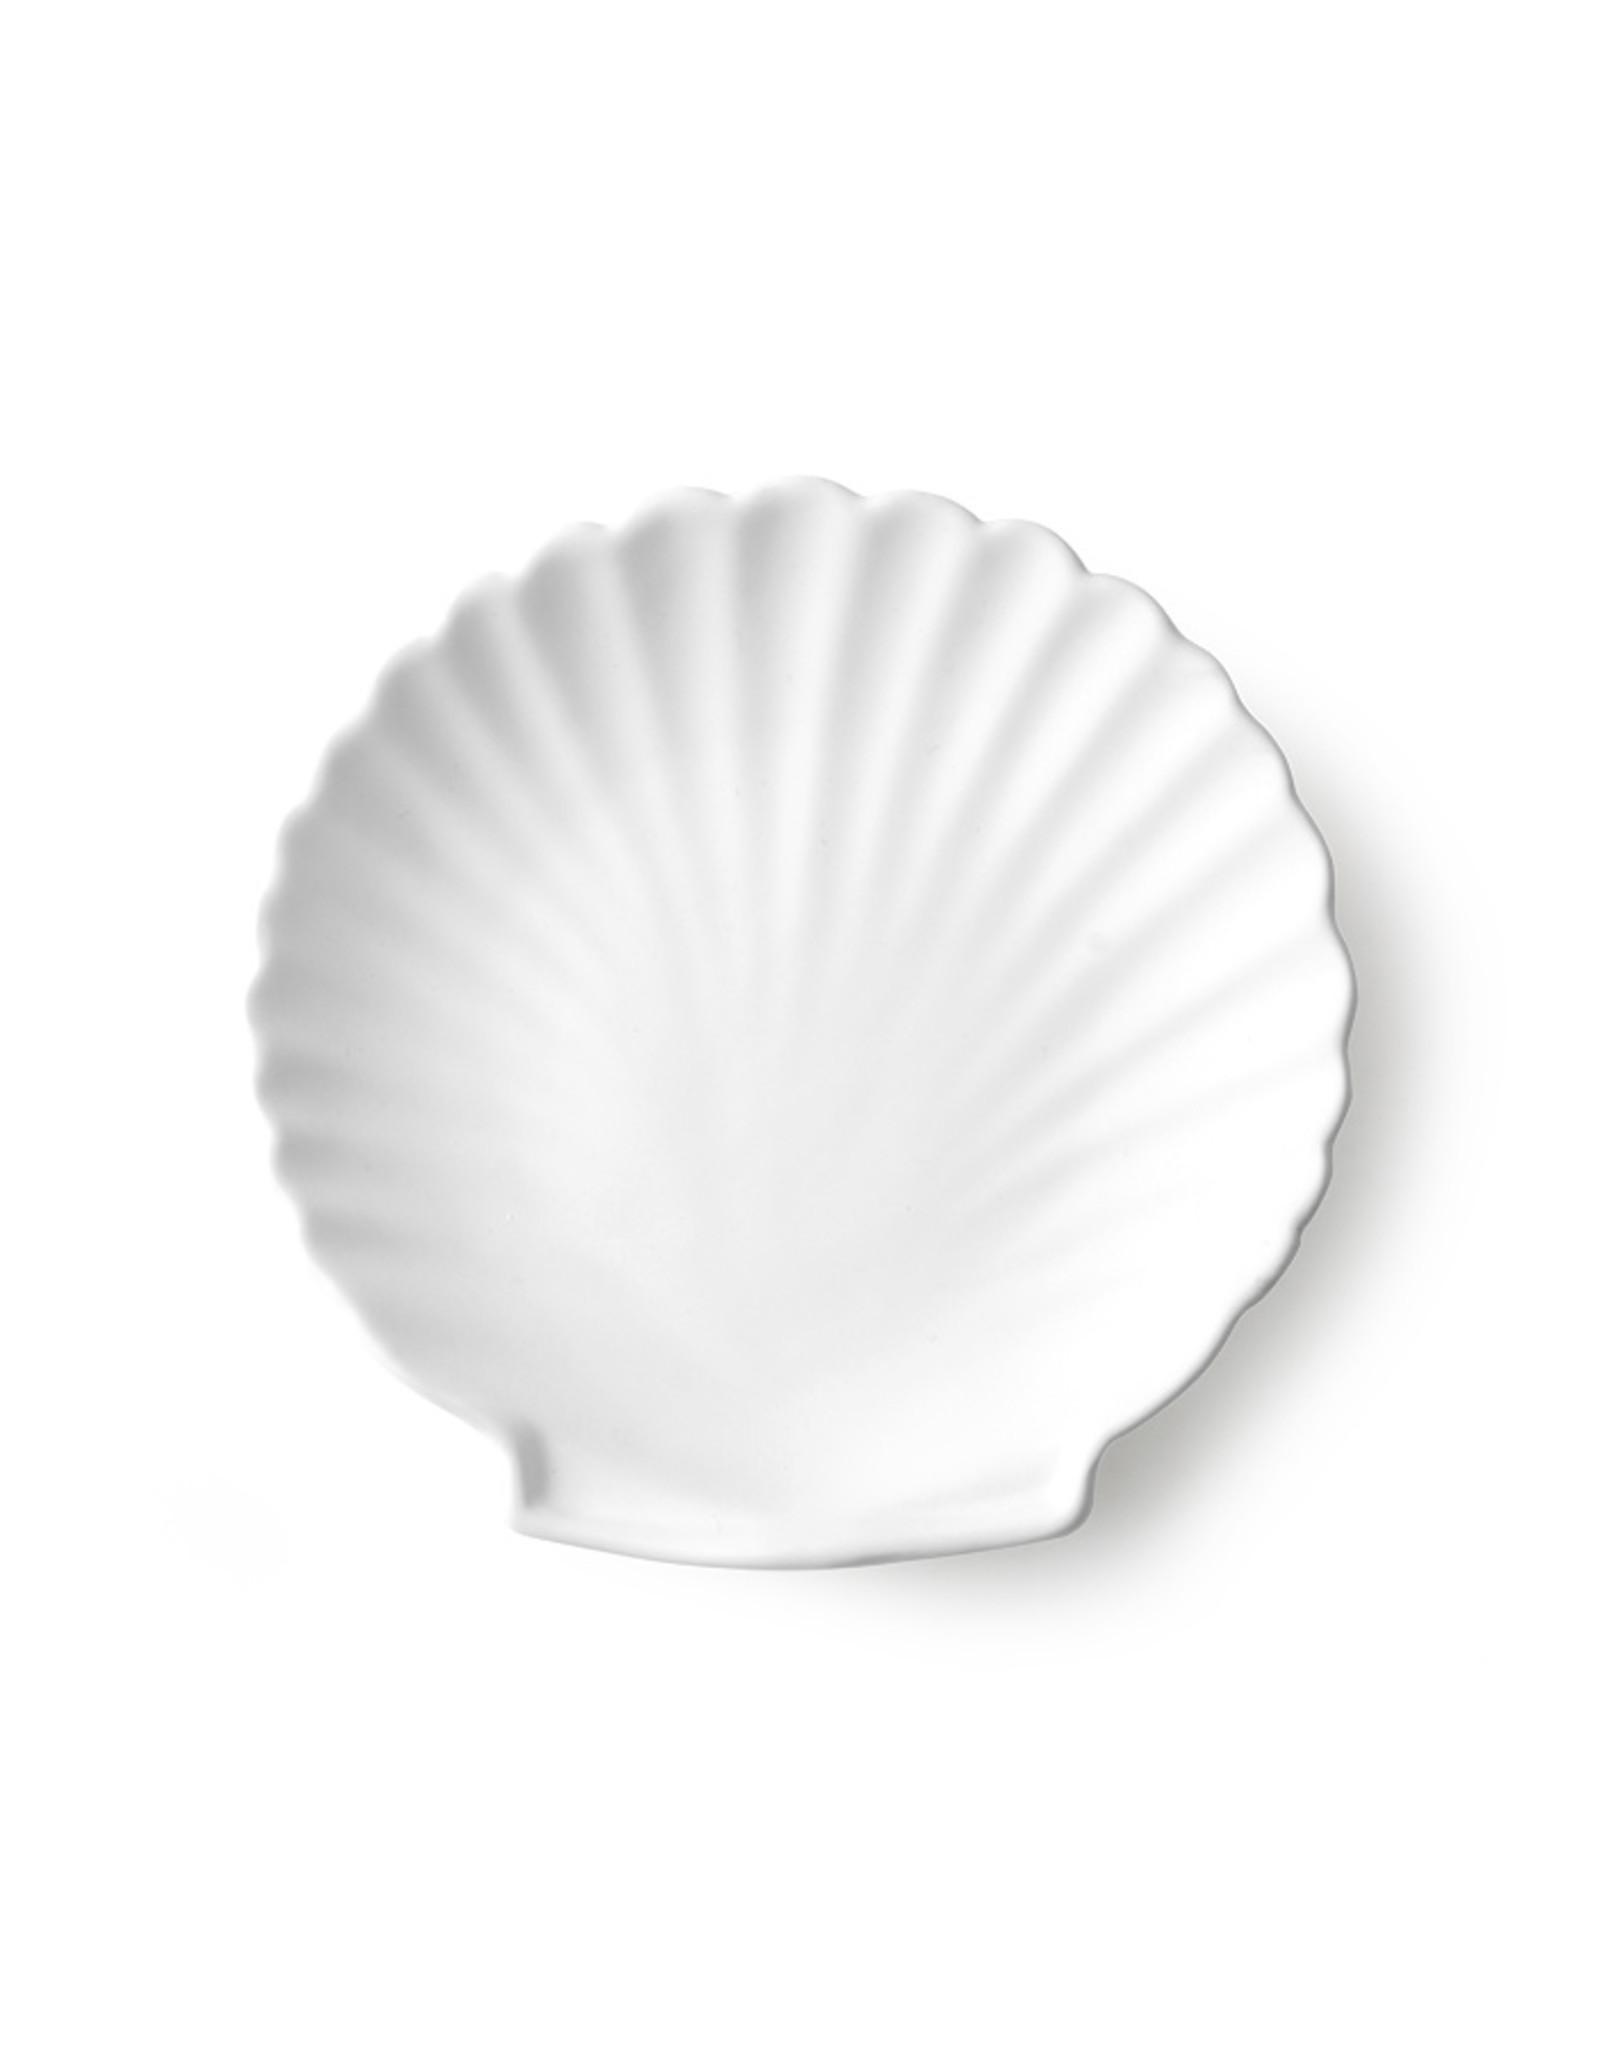 HK Living Athena Ceramics Shell Tray White Matt M